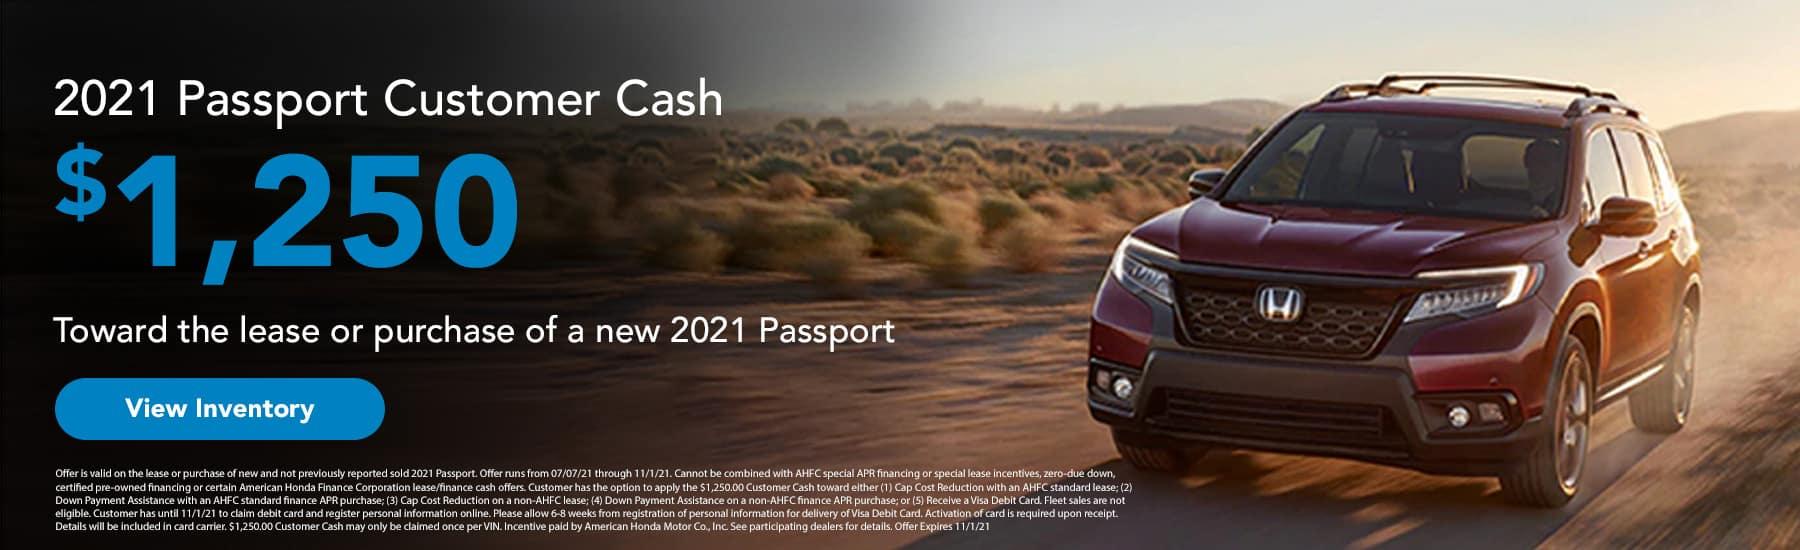 sept2021-passport-v2-desktop-PACHON_SL_1800x550 (1)